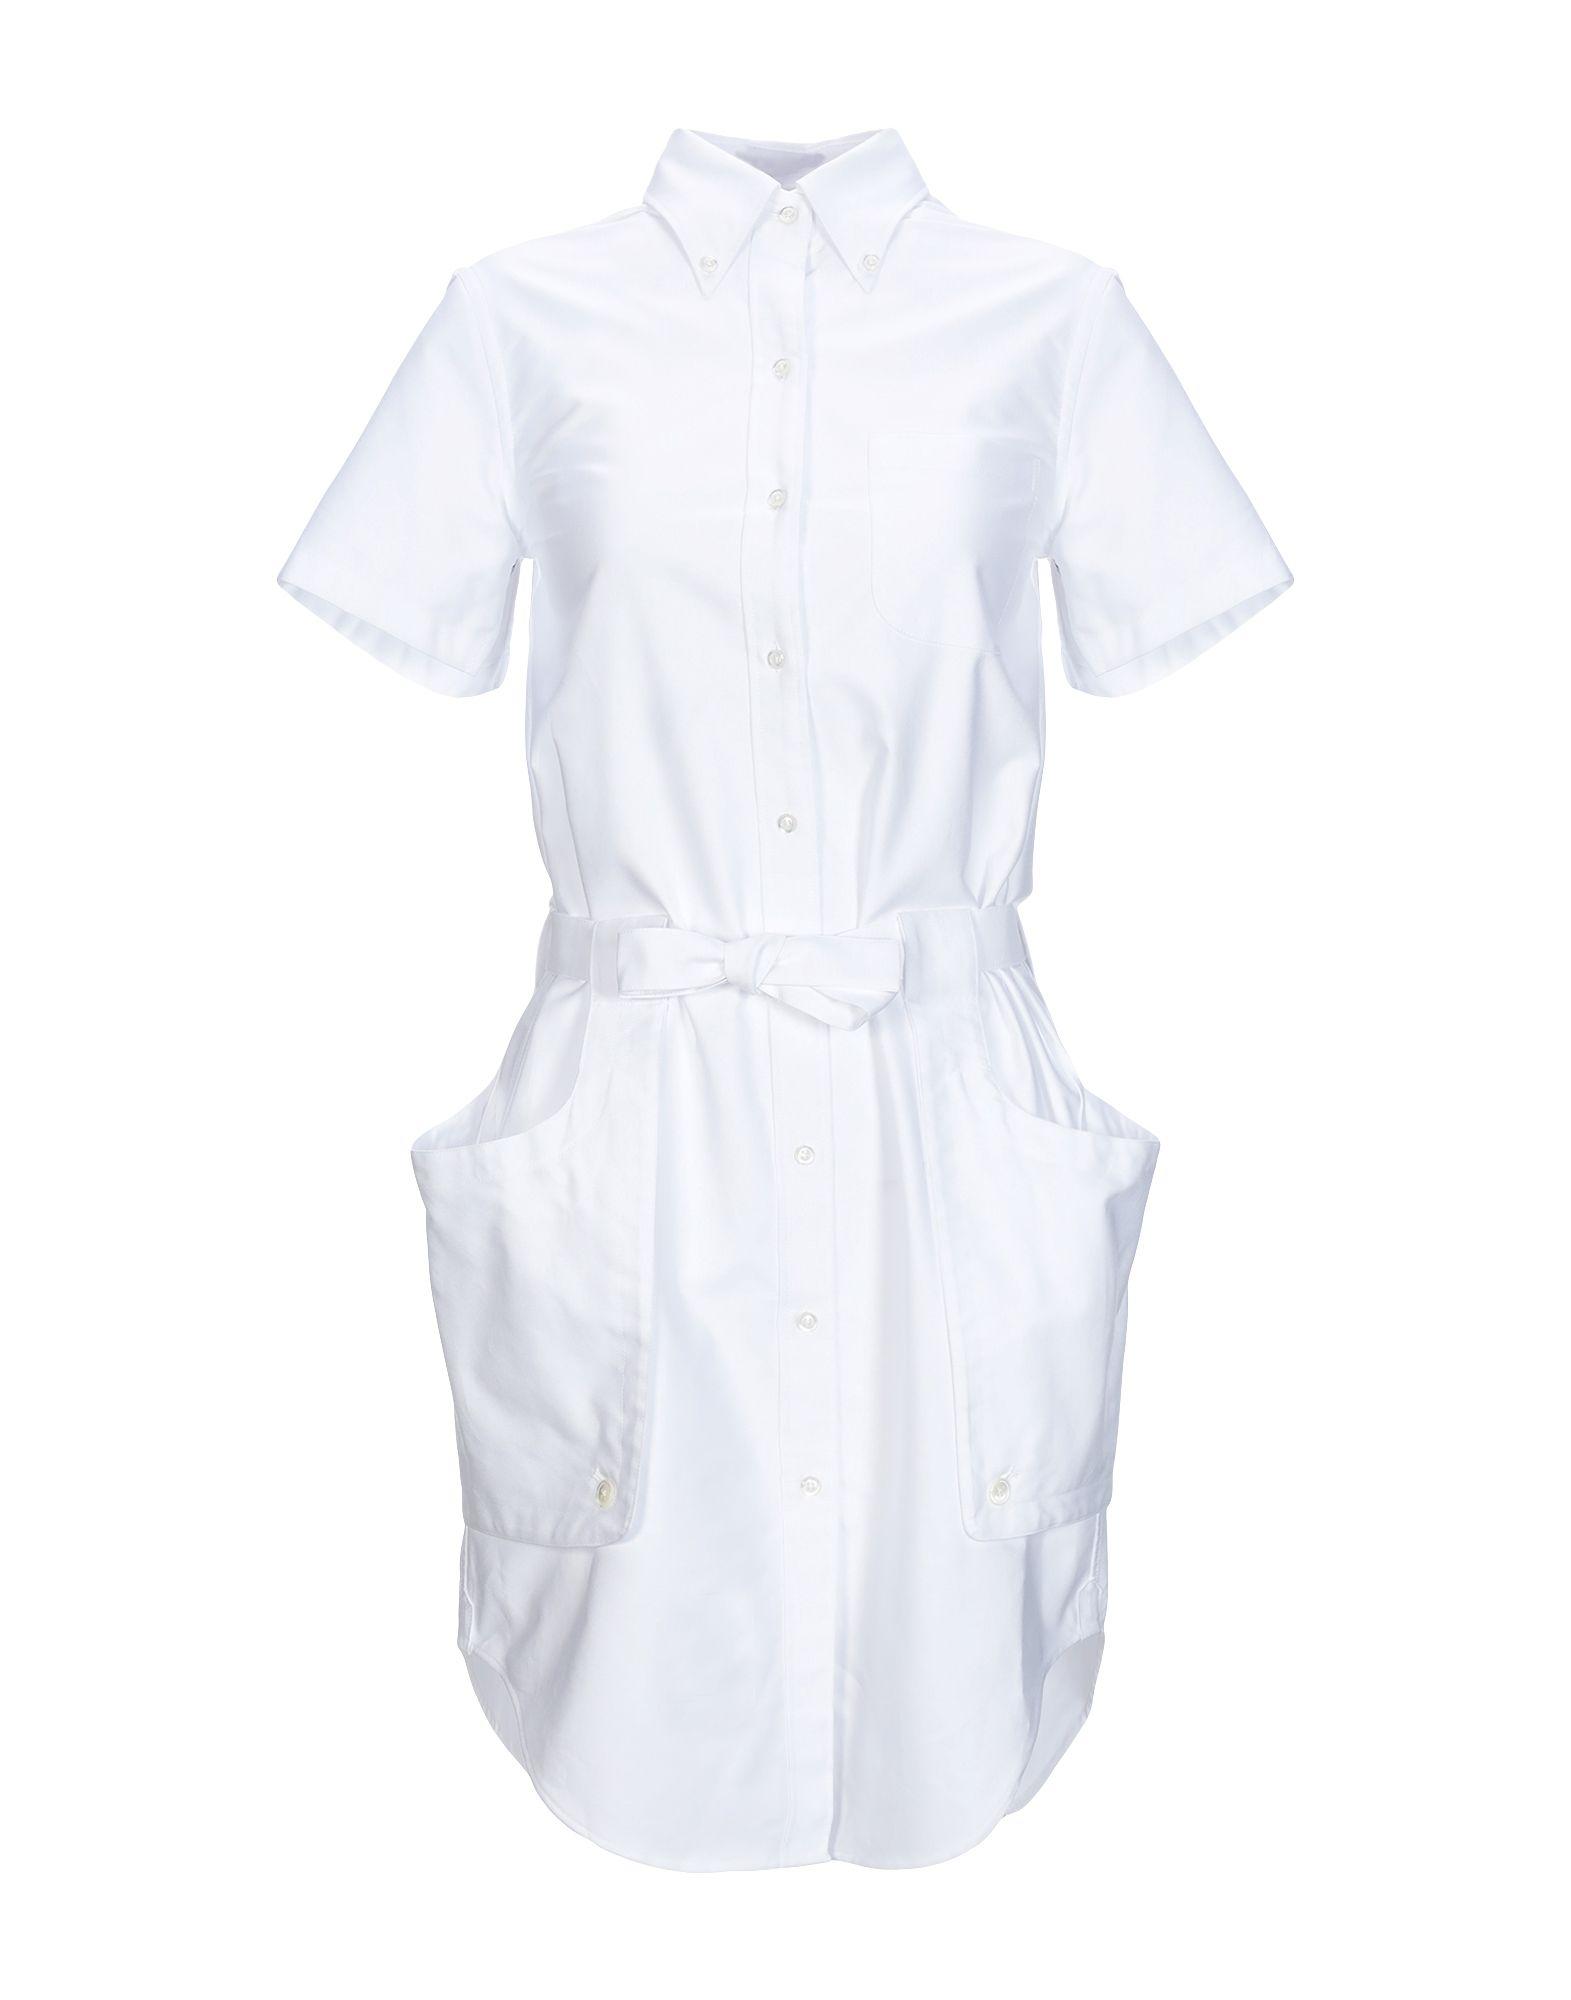 THOM BROWNE Короткое платье платье рубашка fox yulia sway платье рубашка fox